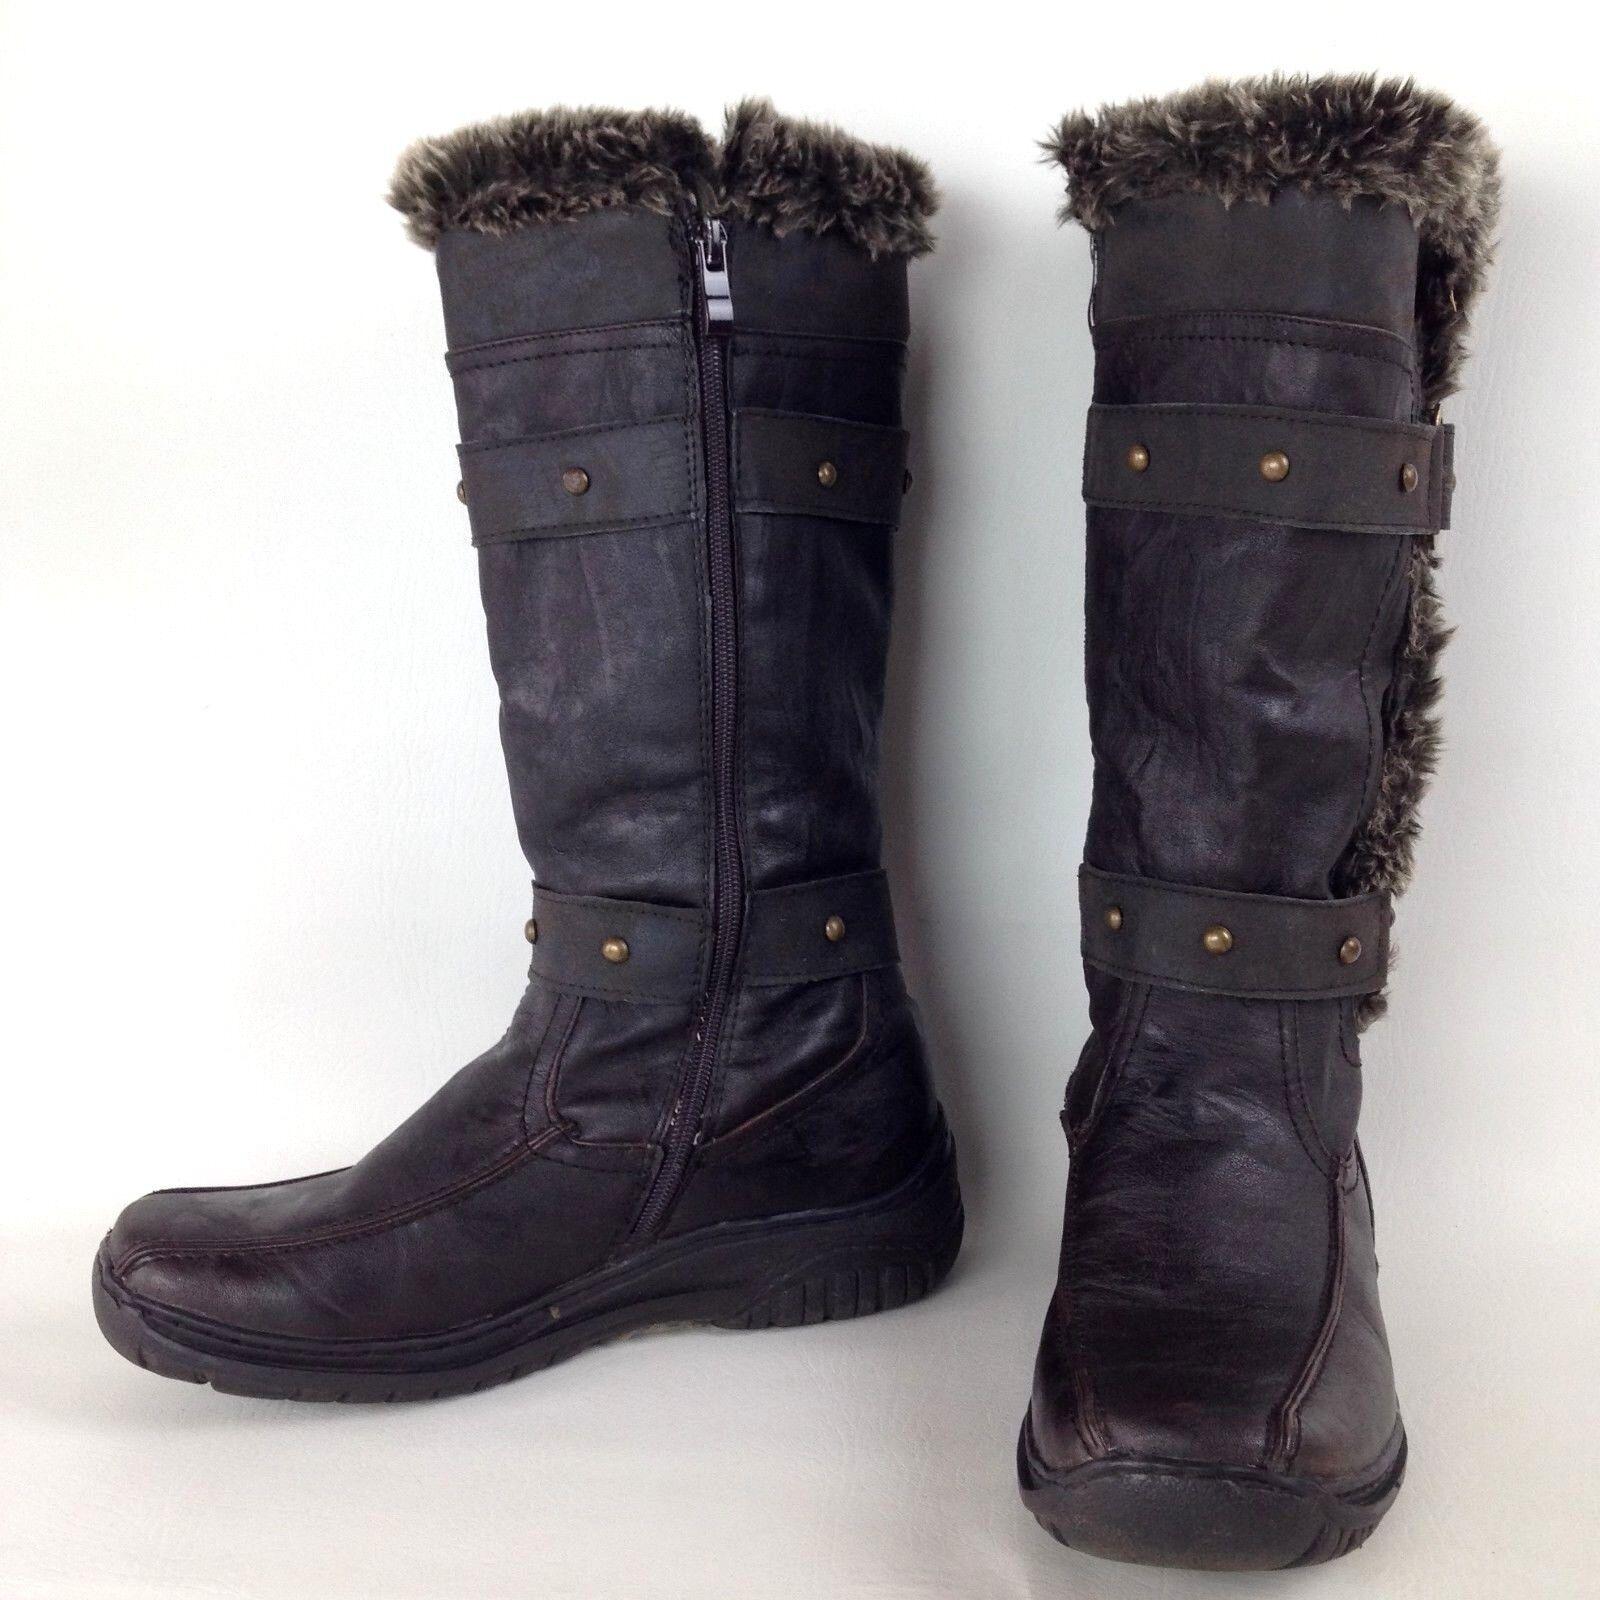 APRES BY LAMO Women's Side Zip Brown Synthetic Suede Faux Fur Comfort Boots Sz 7